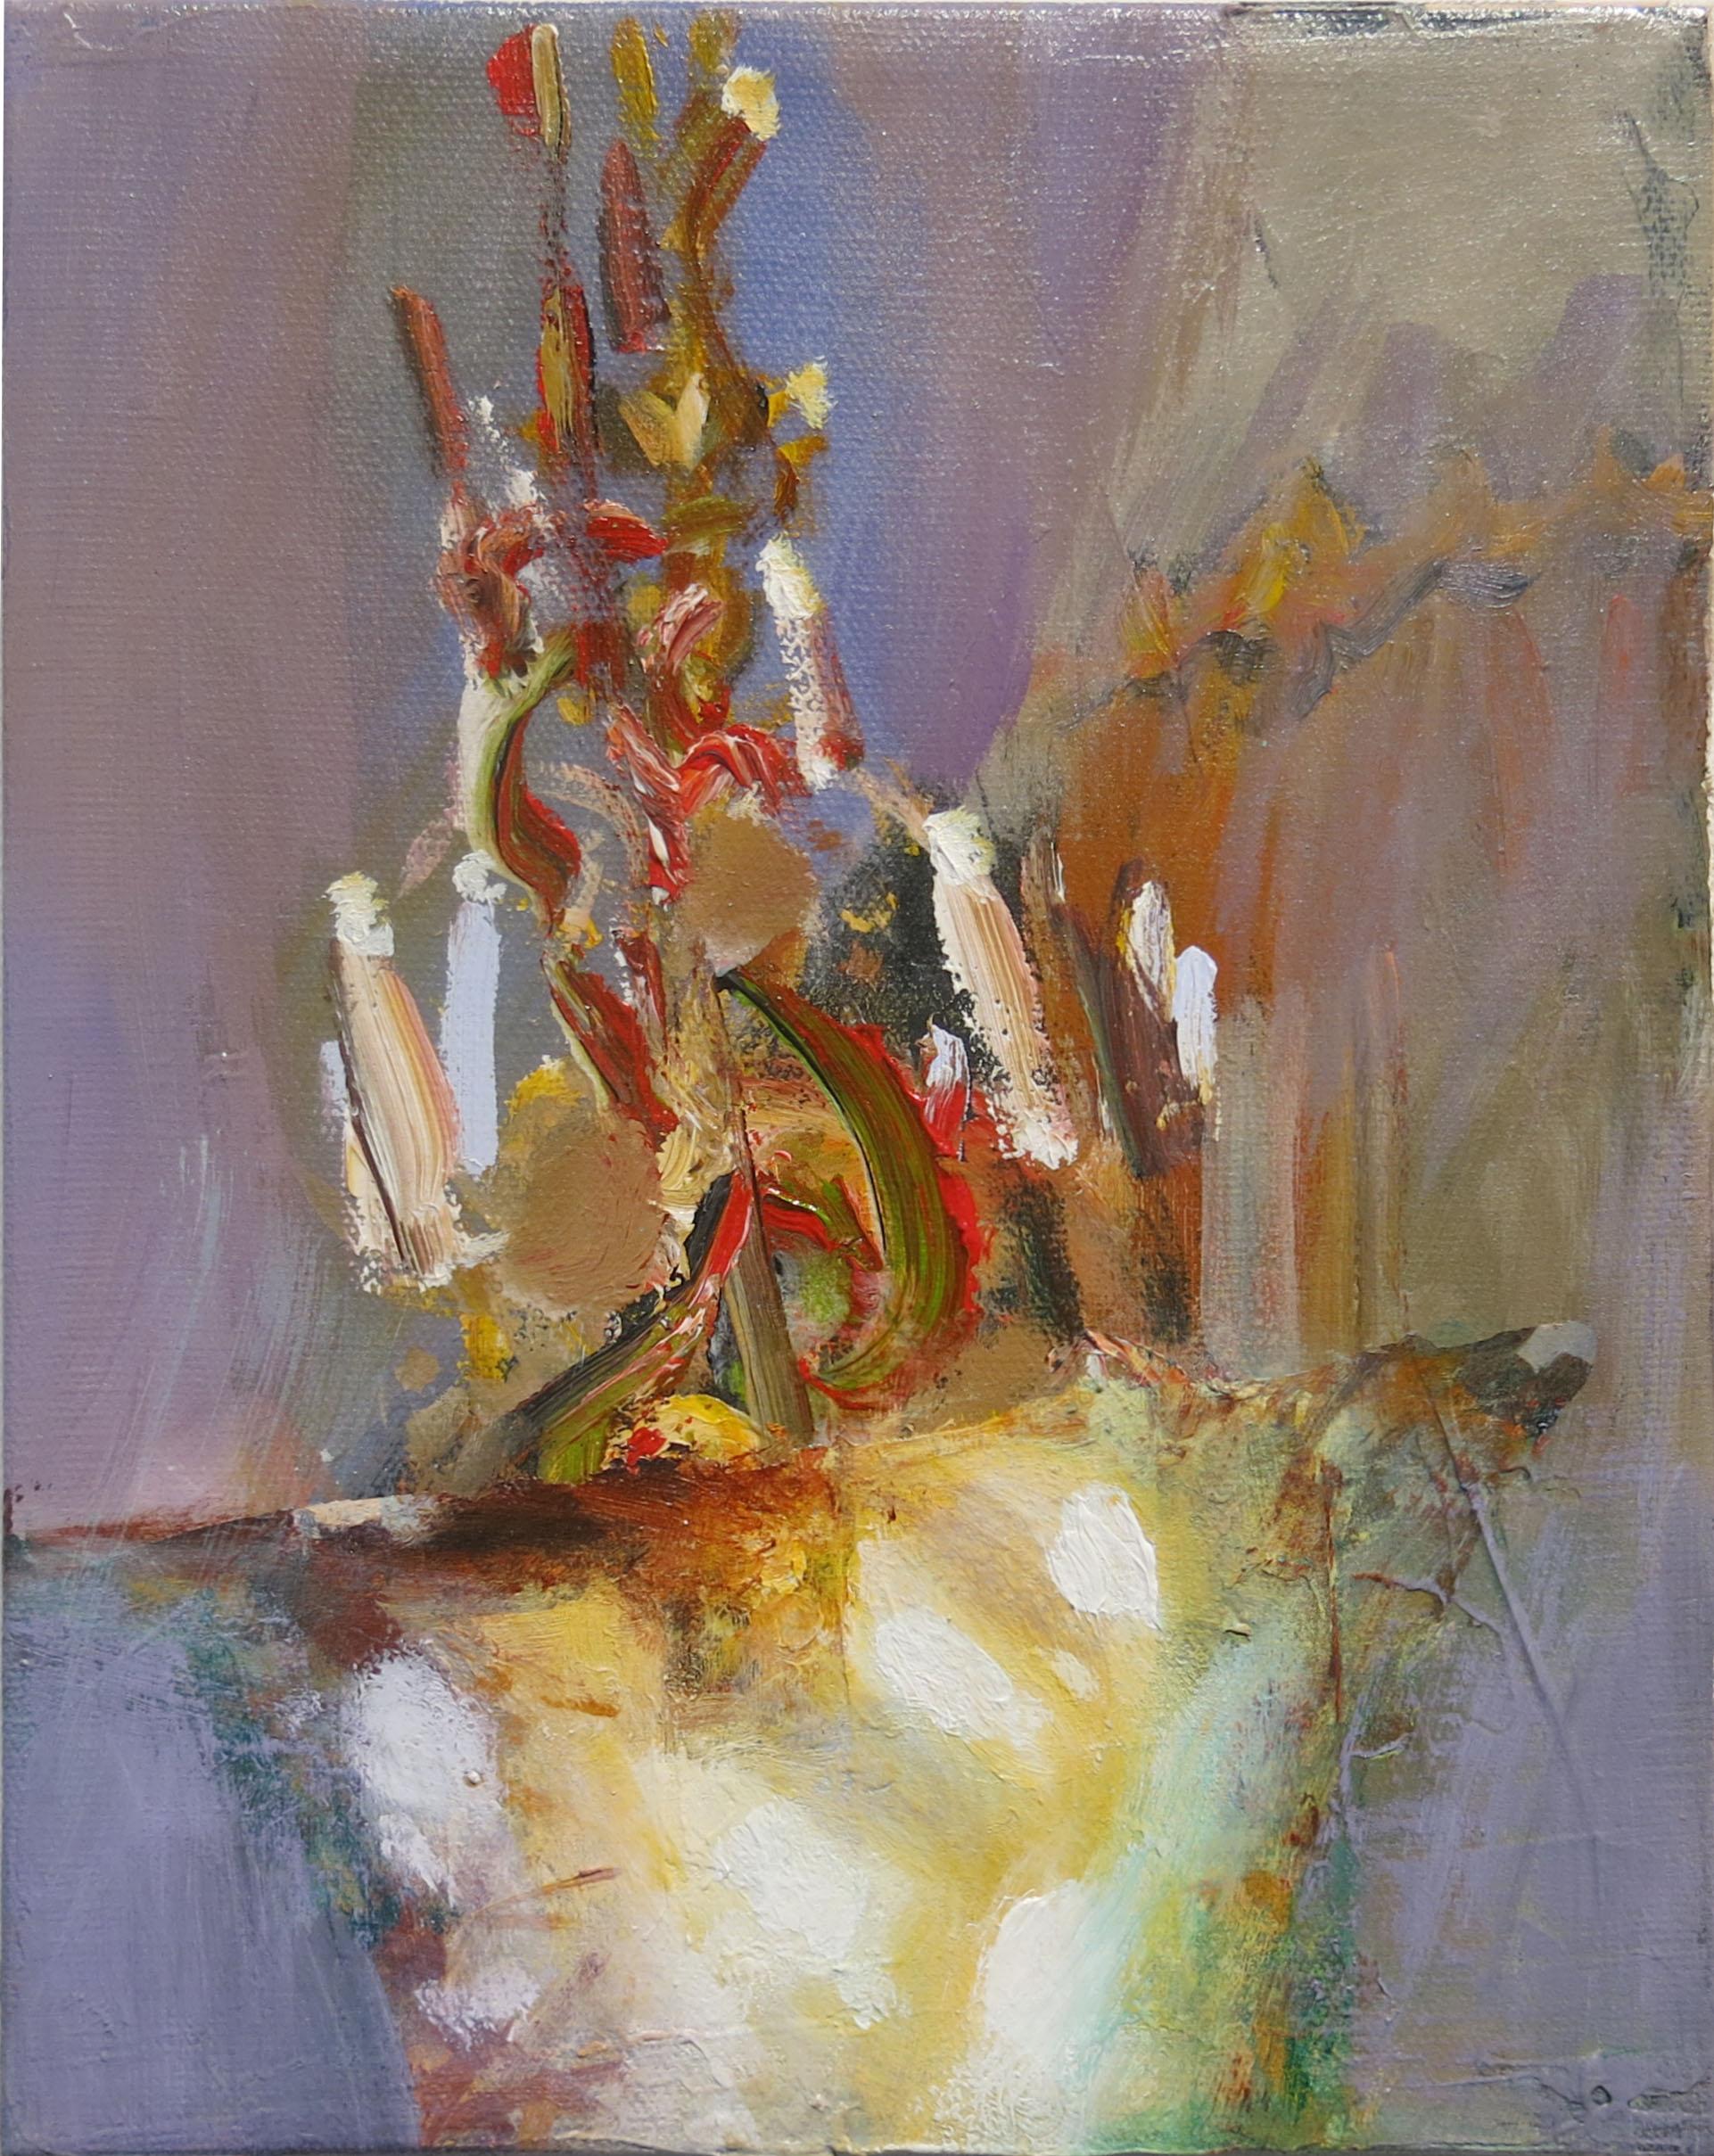 Judith Simonian, Artificial Light, 2014, acrylic on canvas, 10h x 8w in.